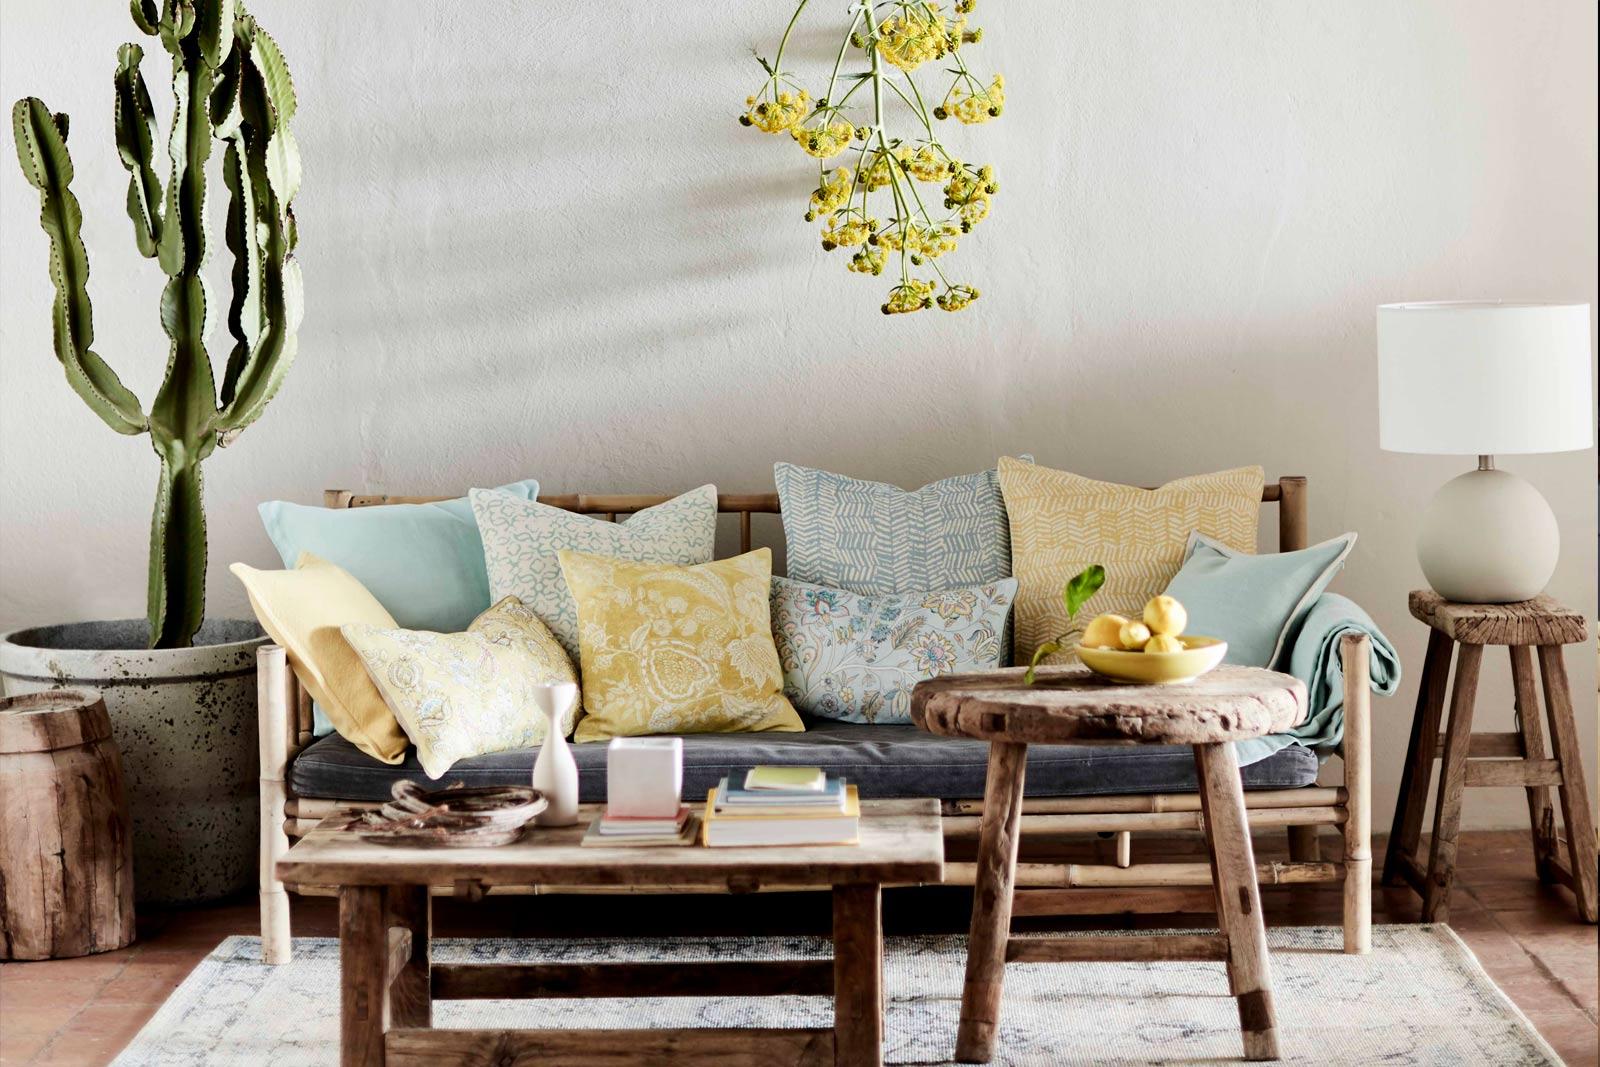 zlatna pravila za opremanje apartmana real iskustvo. Black Bedroom Furniture Sets. Home Design Ideas